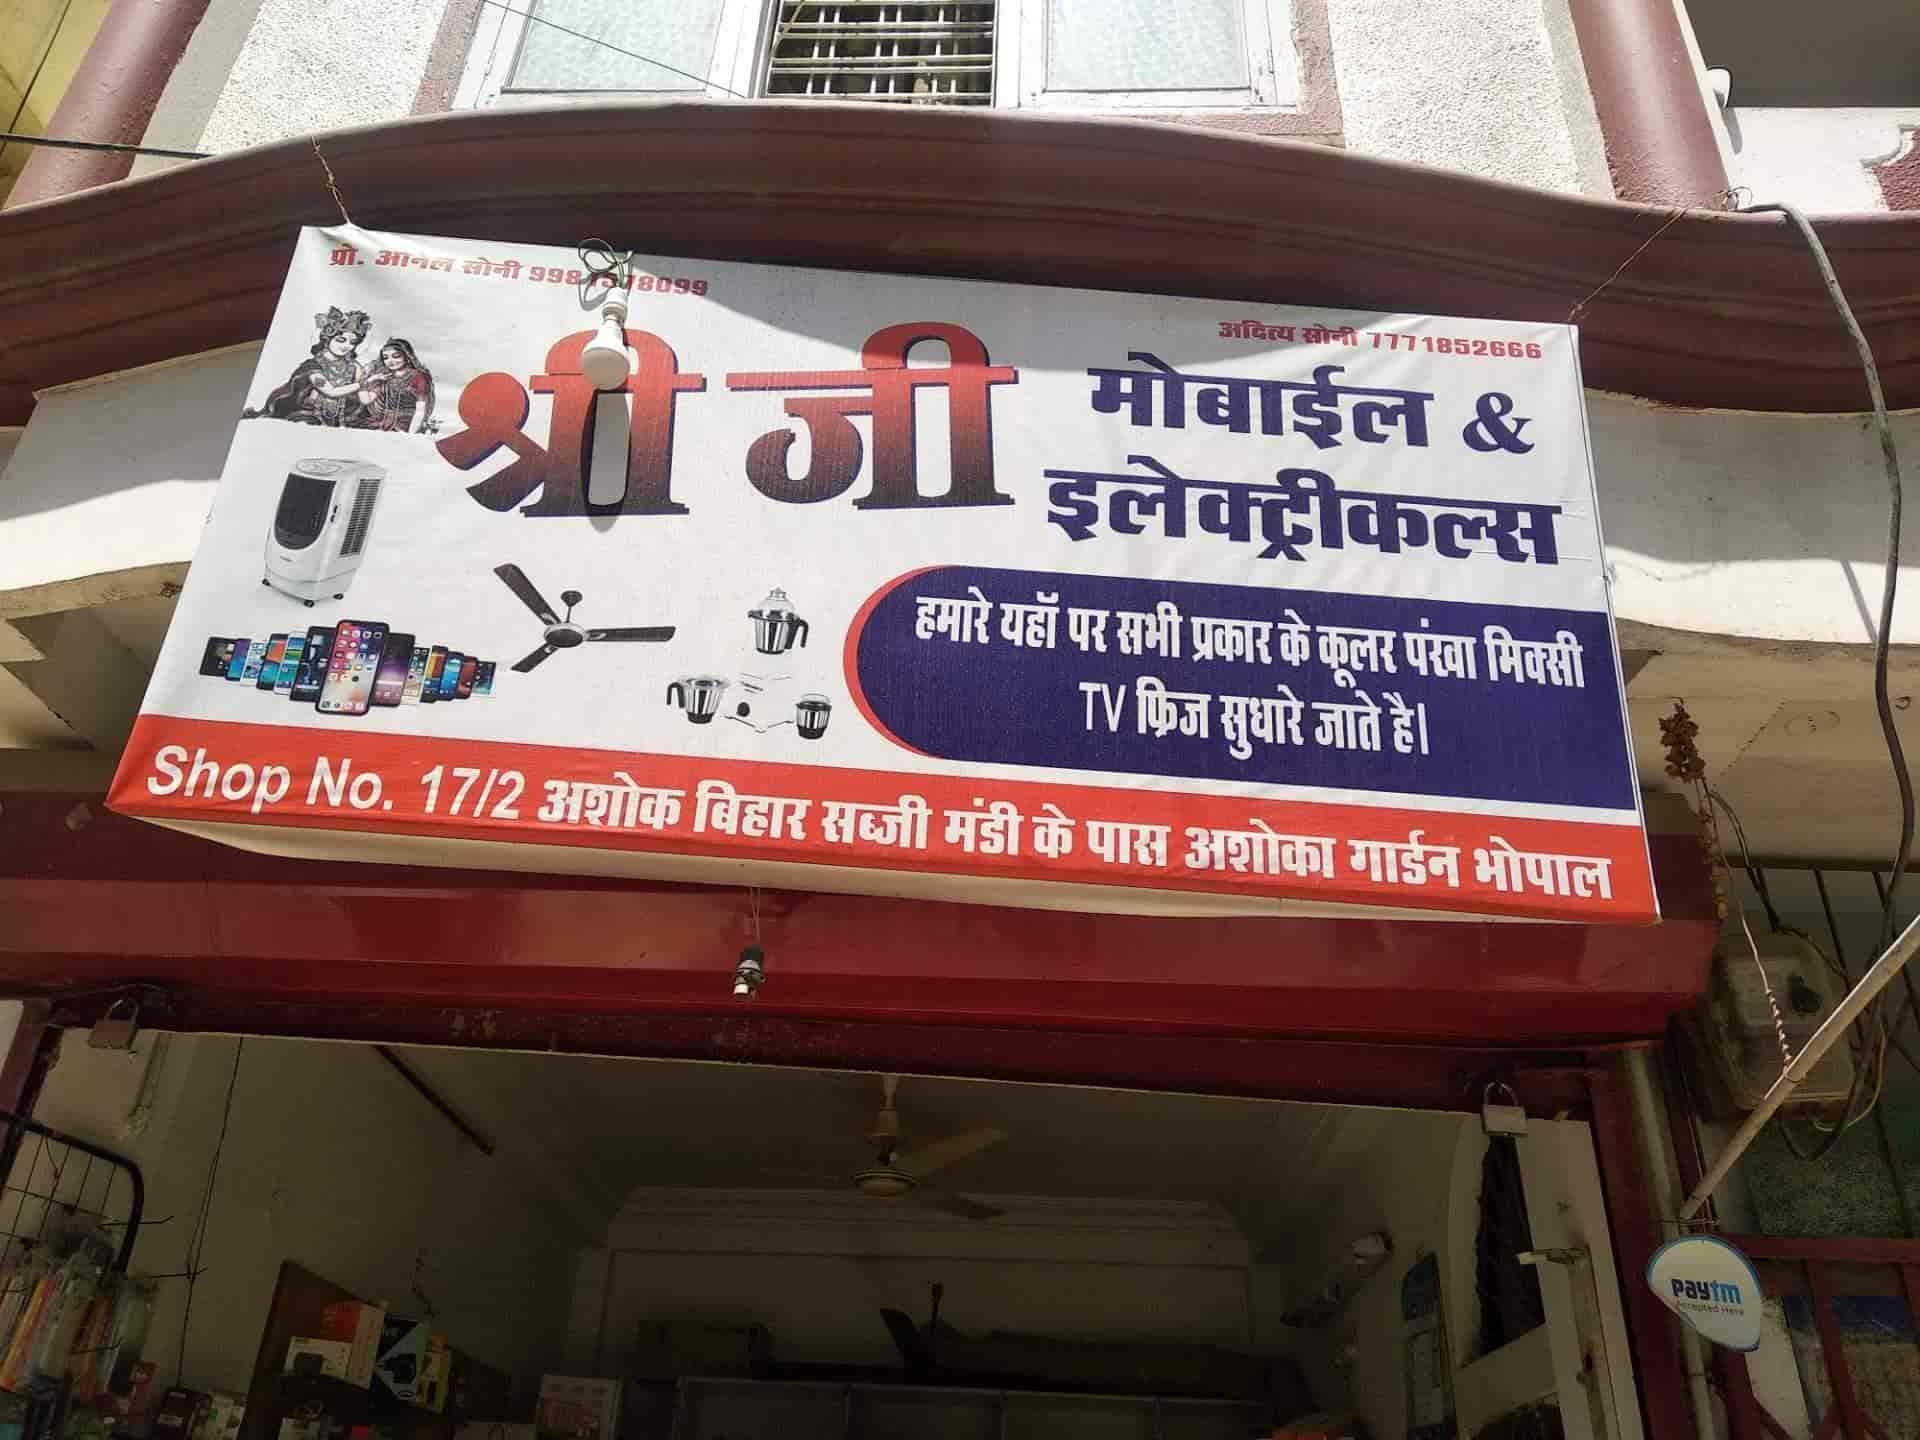 Shri Ji Mobile And Electricals, Ashoka Garden - Mobile Phone